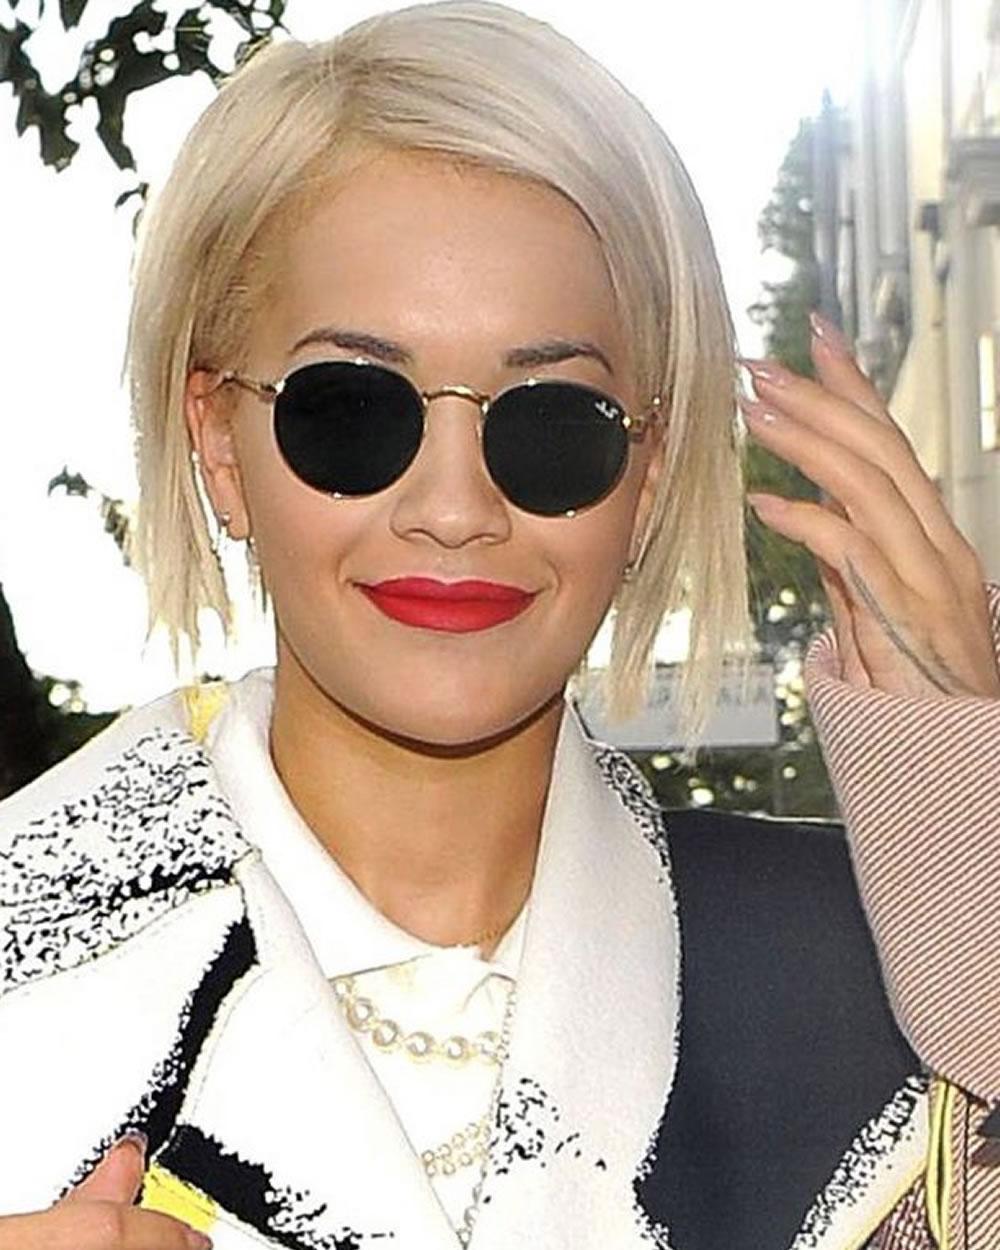 Rita Ora's Short Hairstyles (Pixie + Bob) For 2018 | Celebrity Within Rita Ora Short Hairstyles (View 6 of 25)